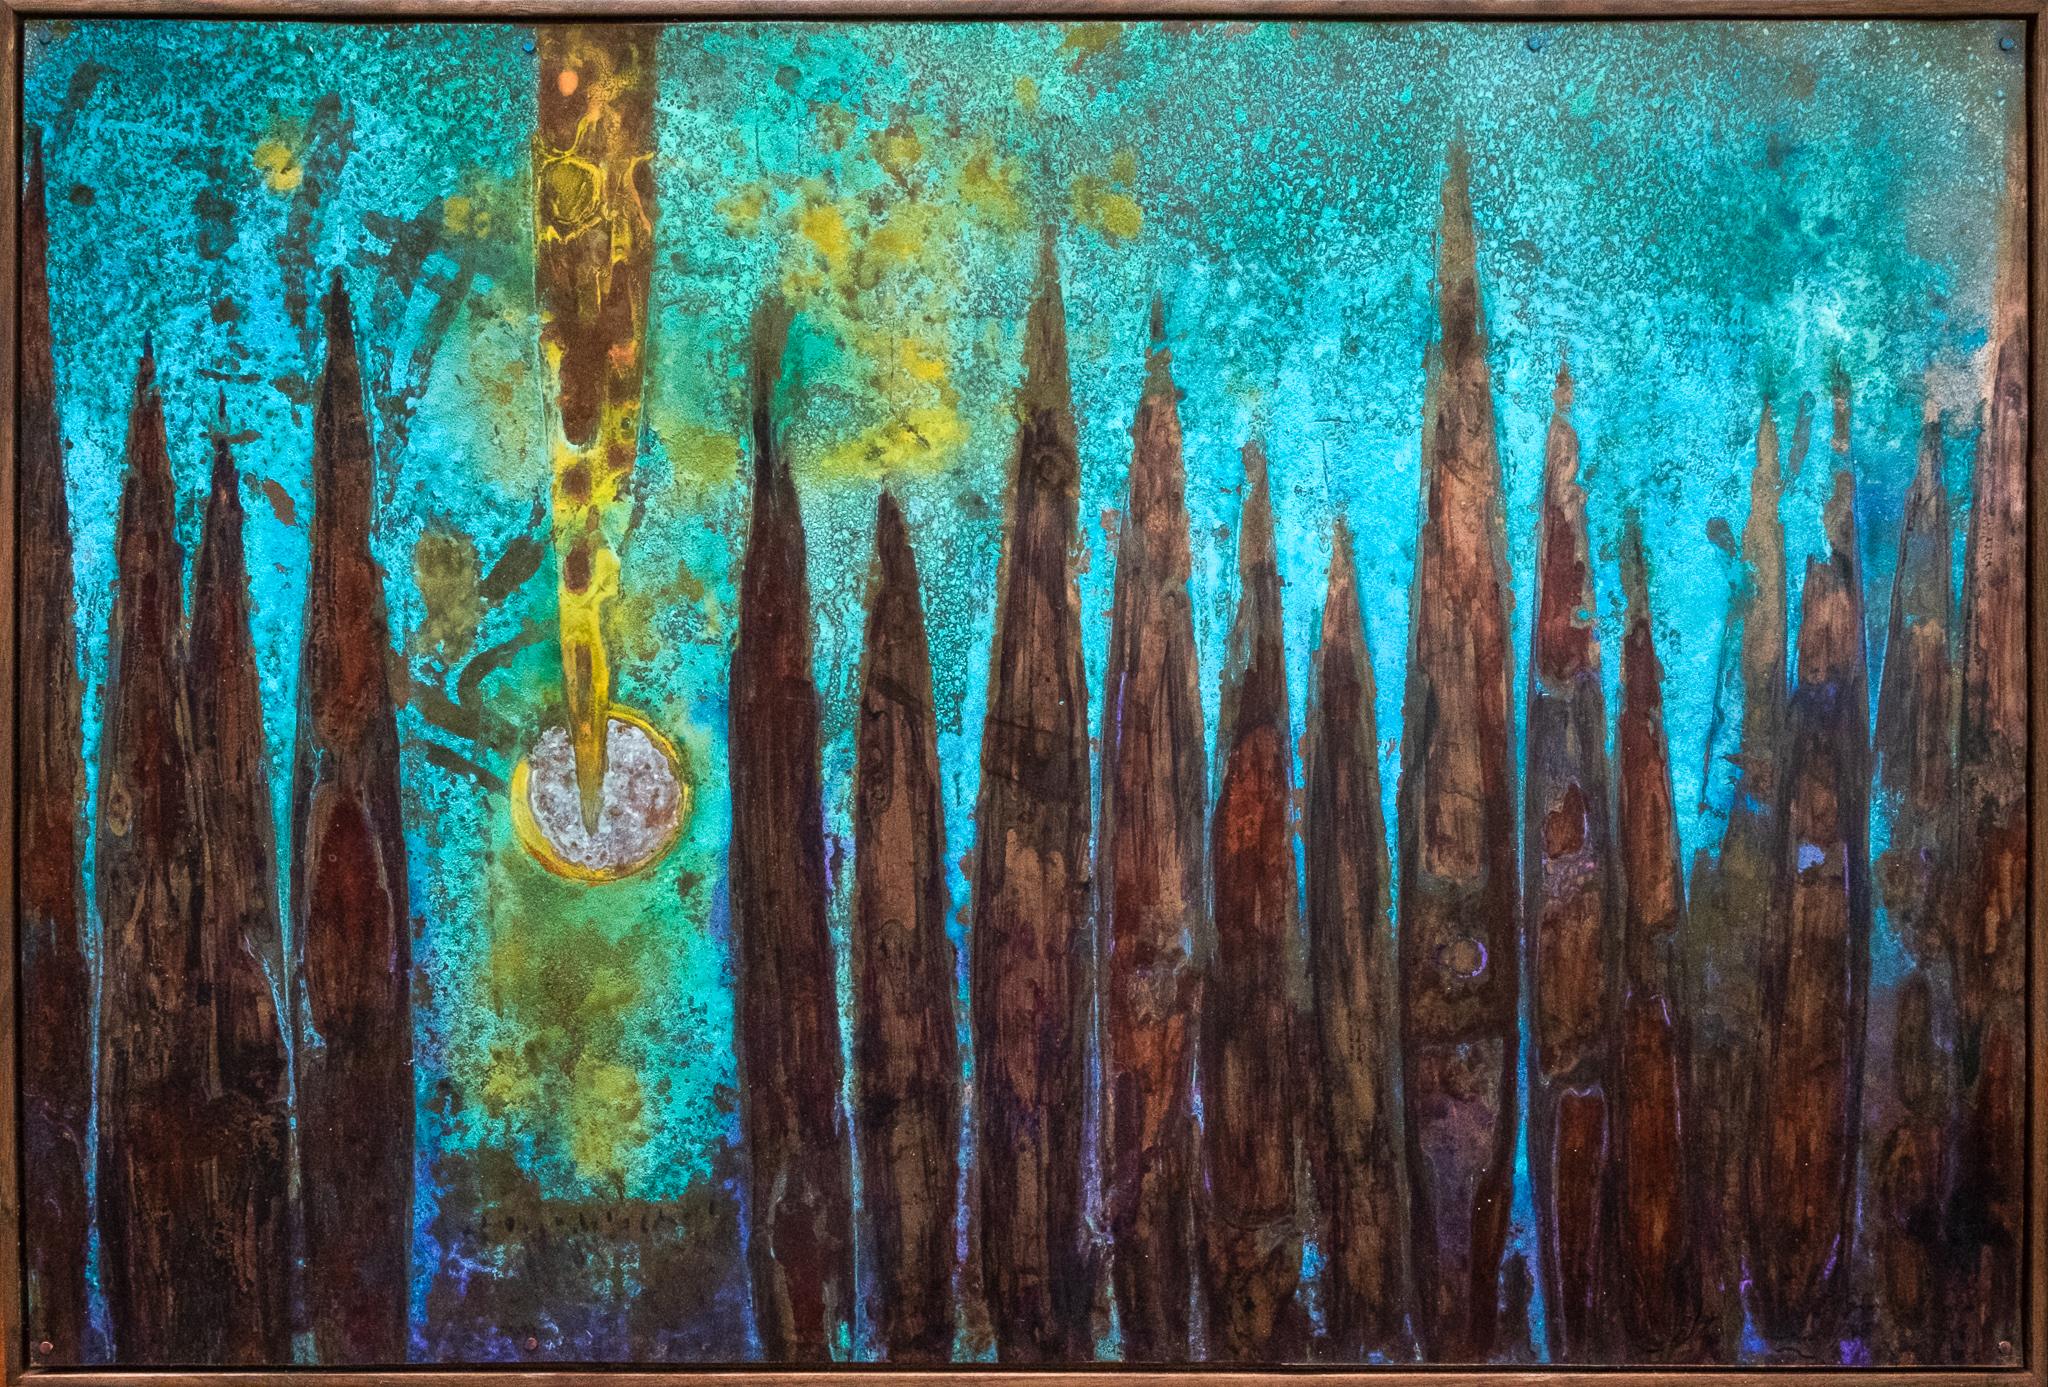 sanford-mcgee-copper-art-tennessee-grass-sun-moon.jpg